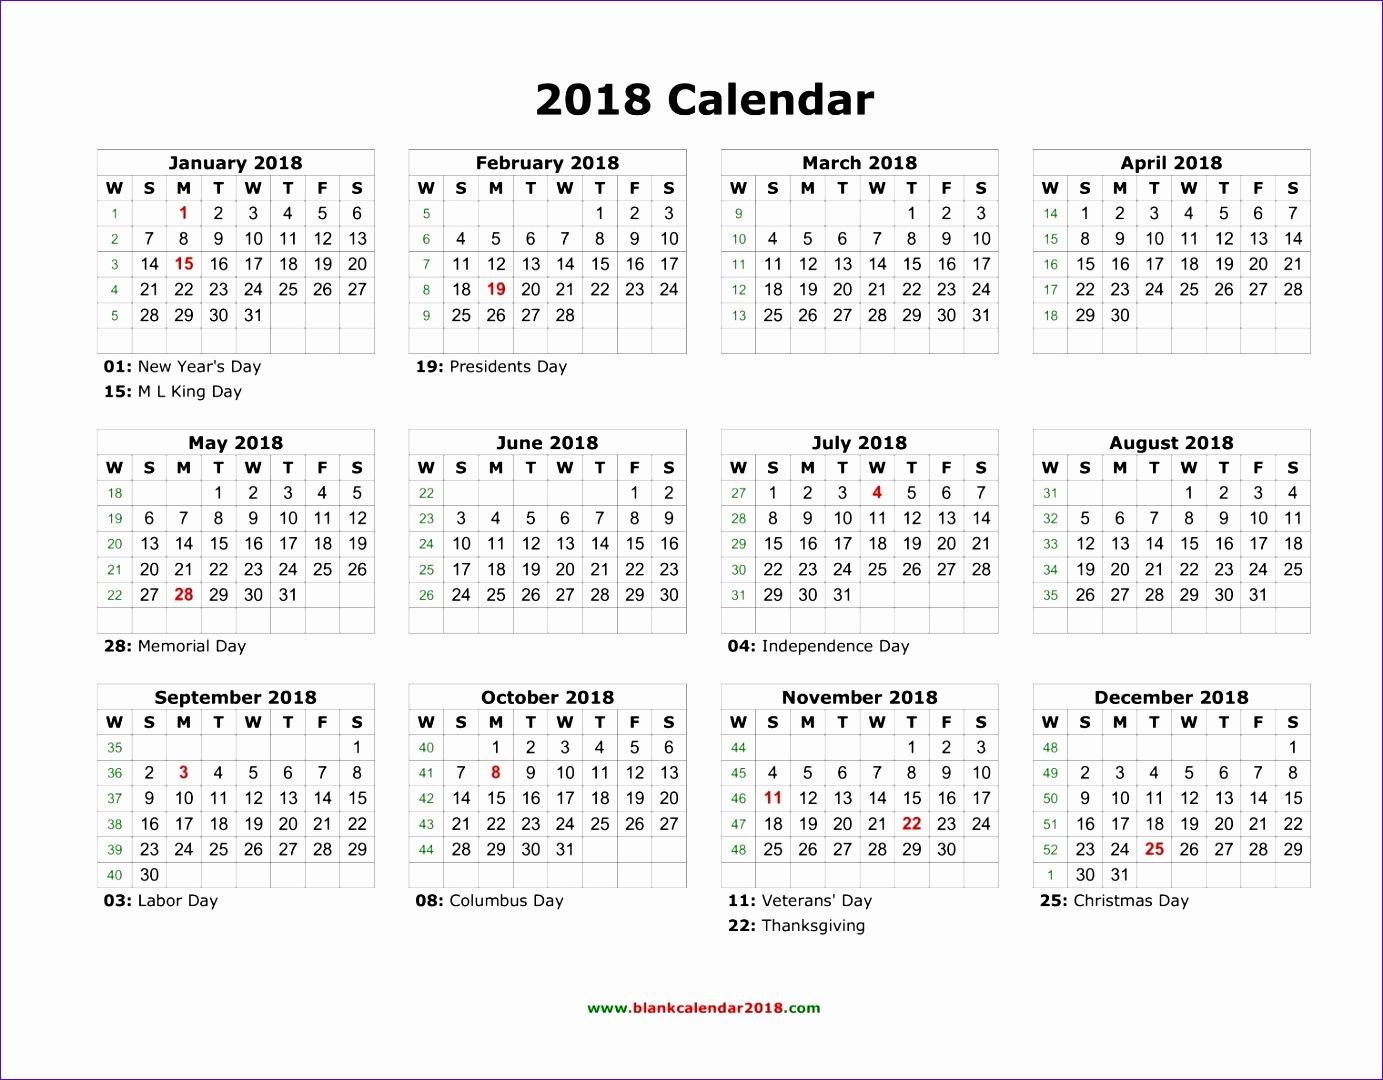 2018 calendar 1798 13831080